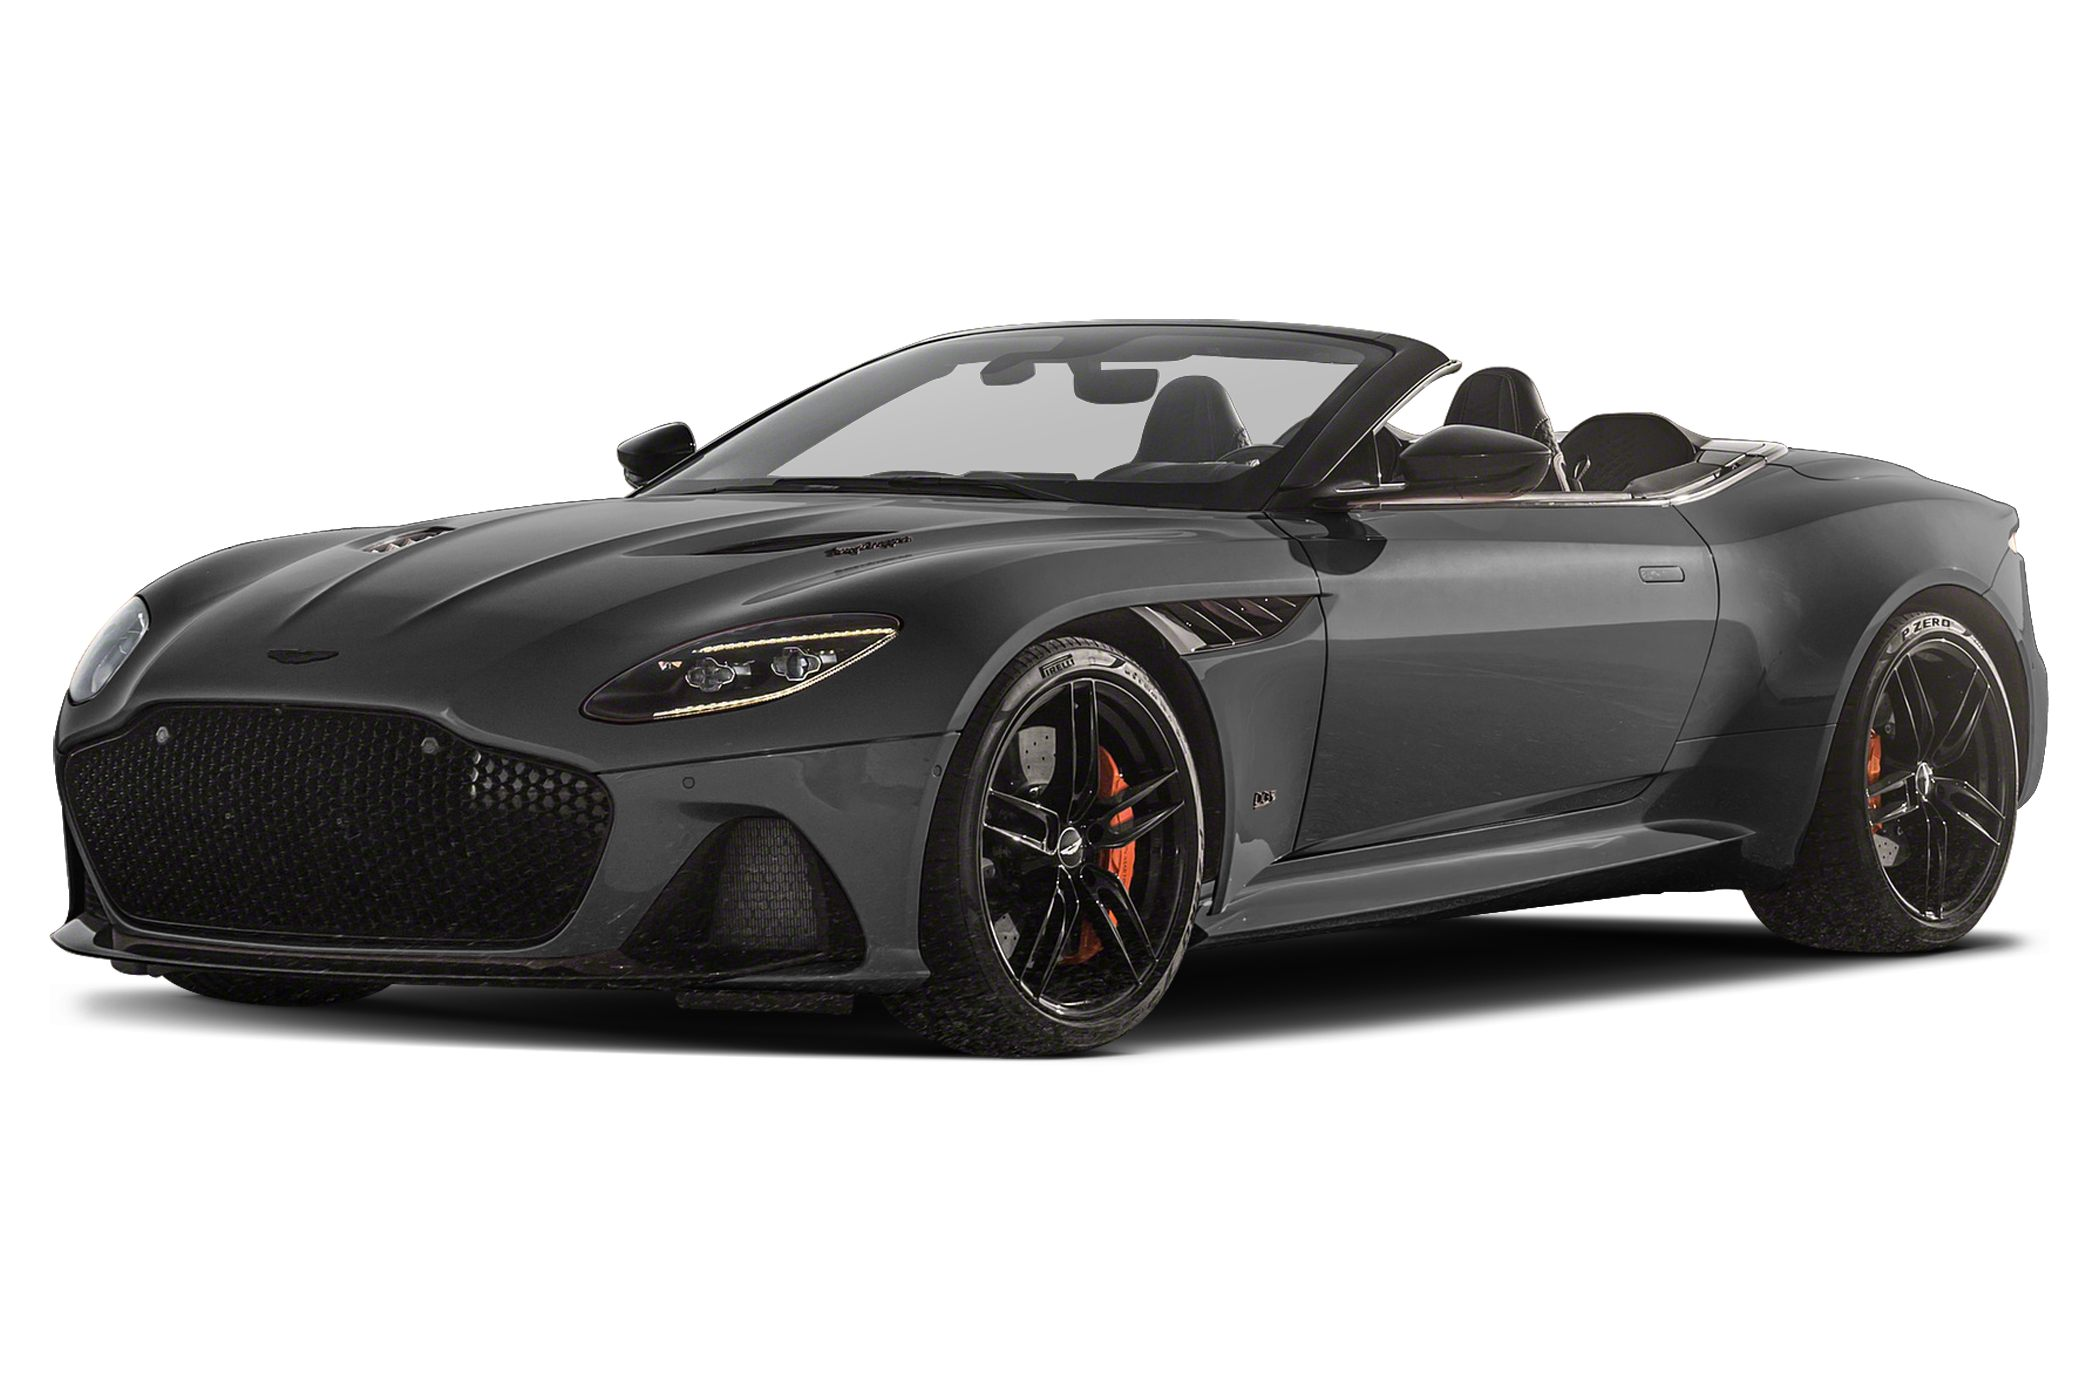 2021 Aston Martin Dbs Superleggera Volante 2dr Convertible Pricing And Options